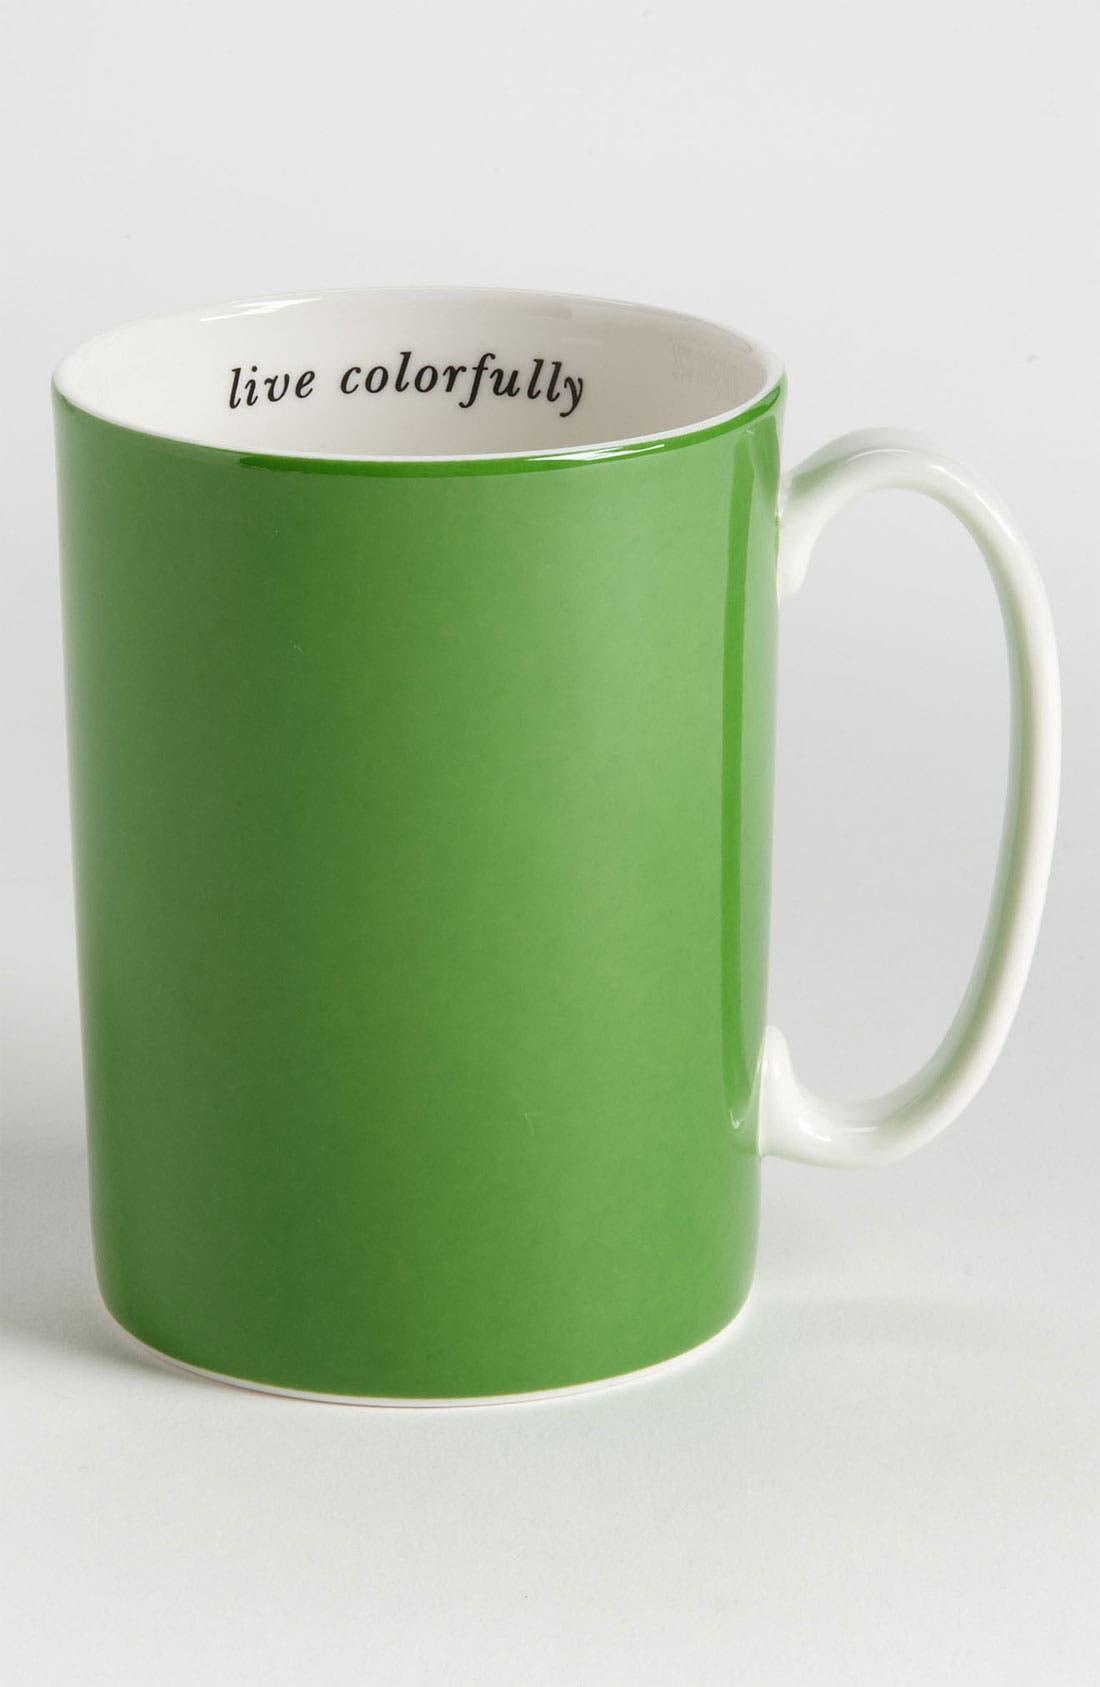 Main Image - kate spade new york 'say the word - live colorfully' porcelain mug